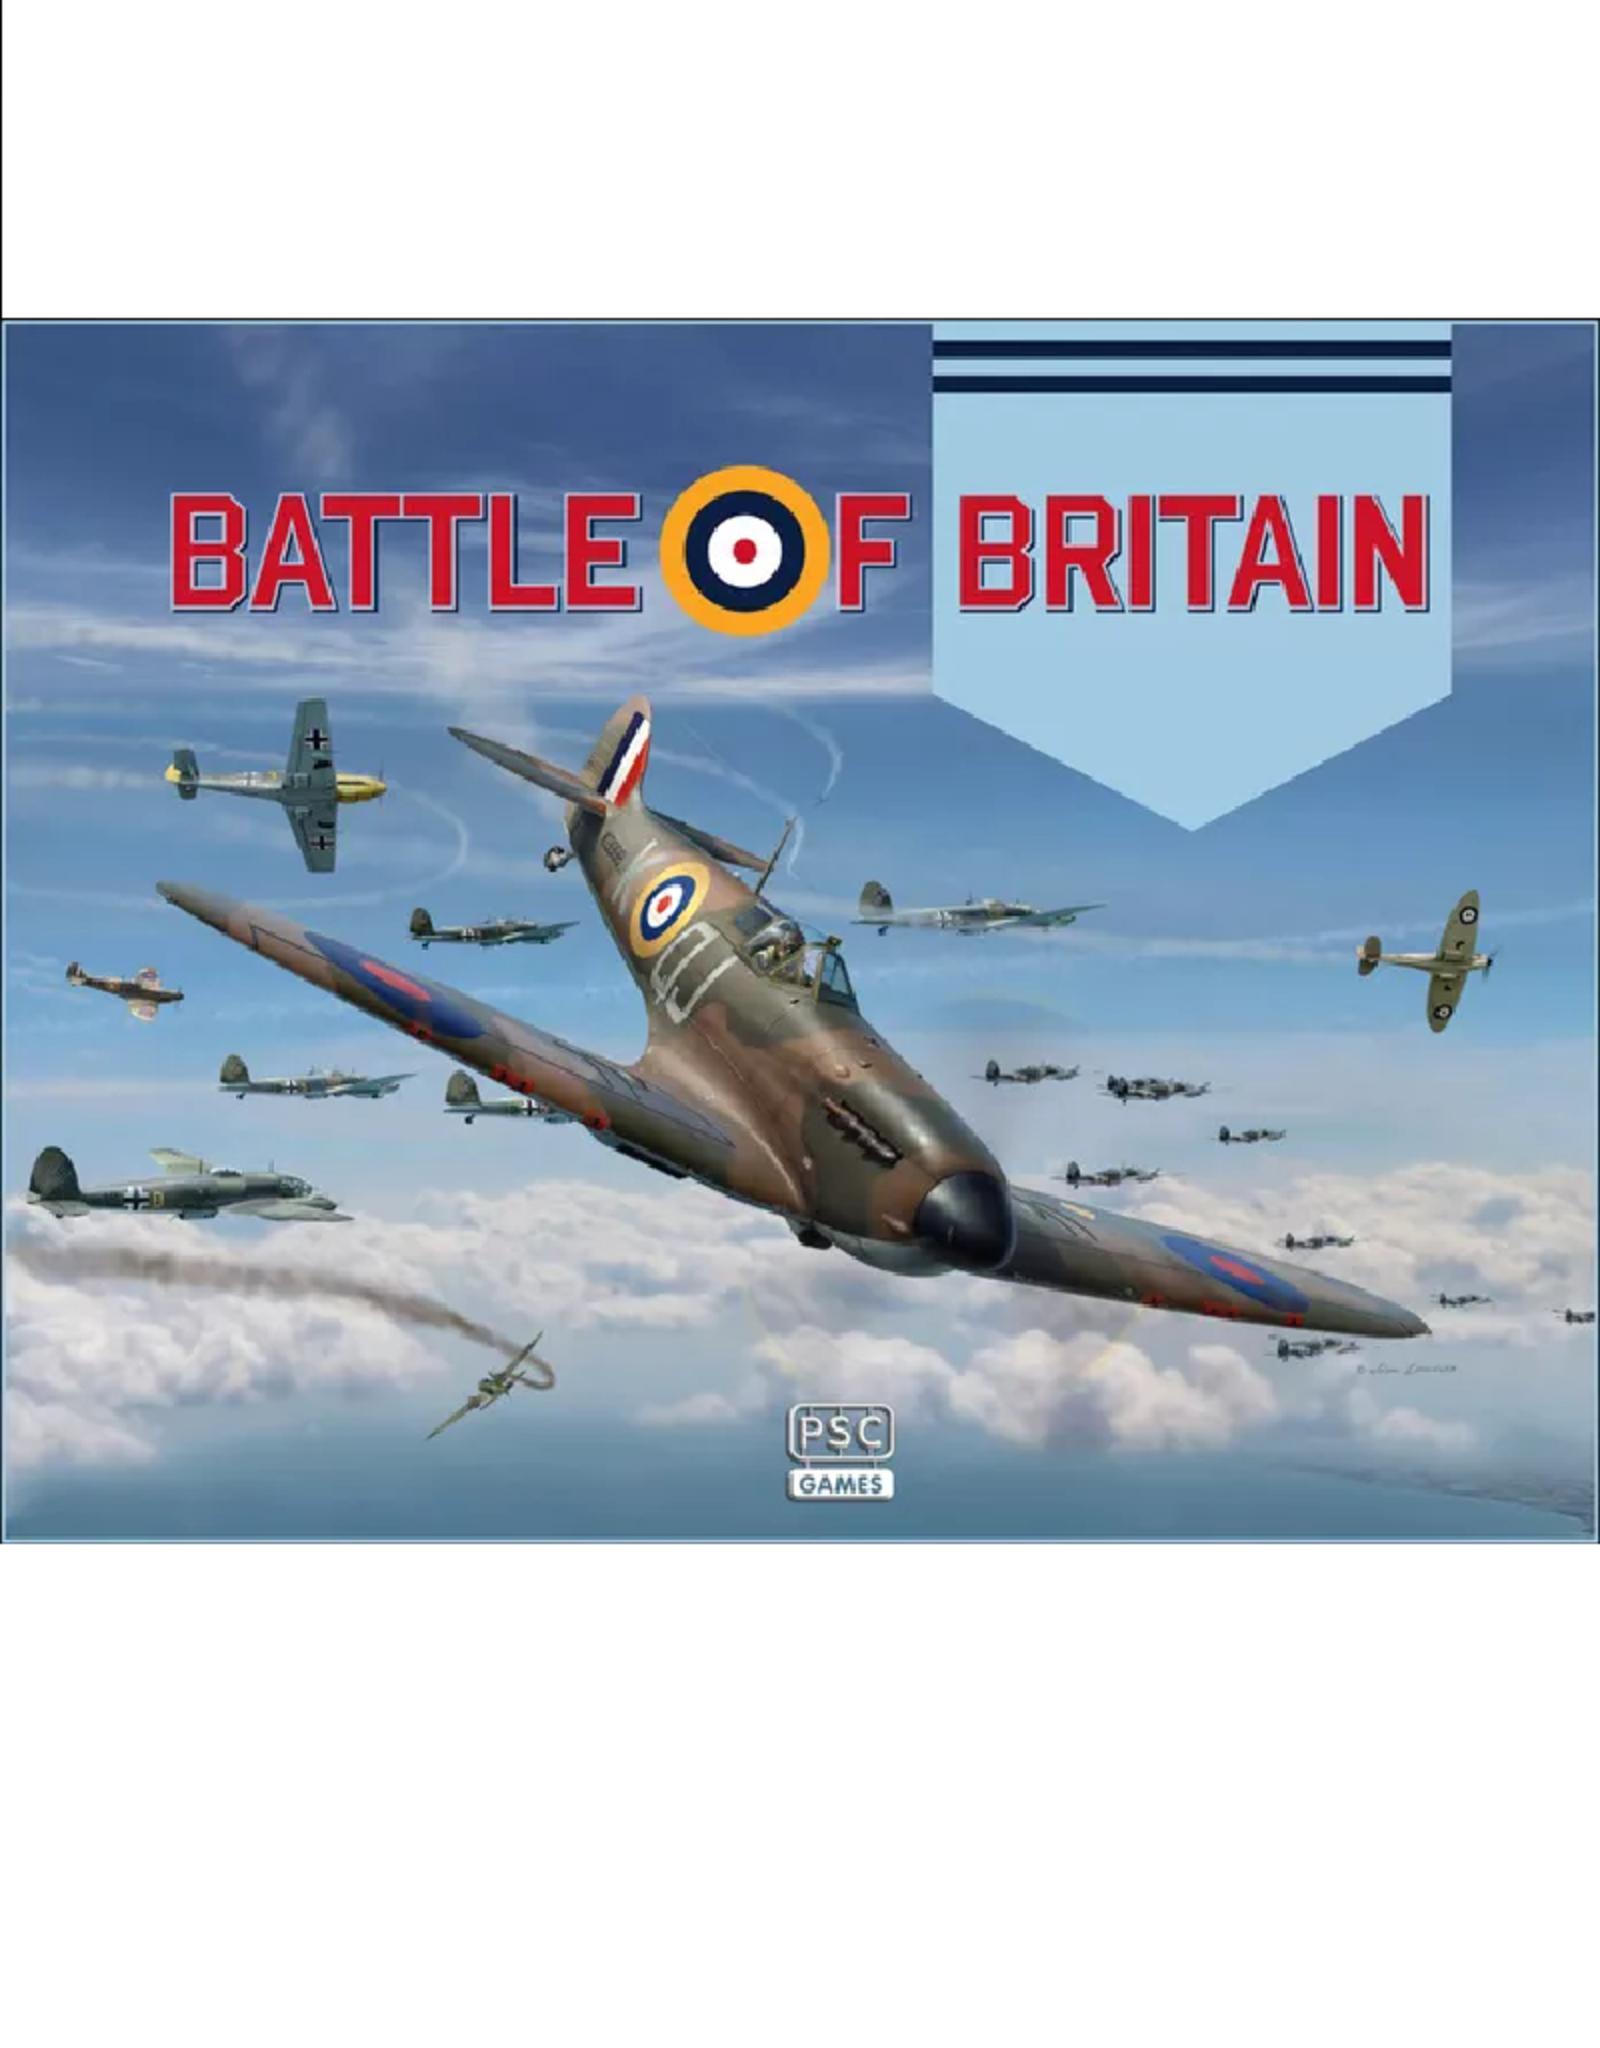 Plastic Soldier Company Battle of Britain board game